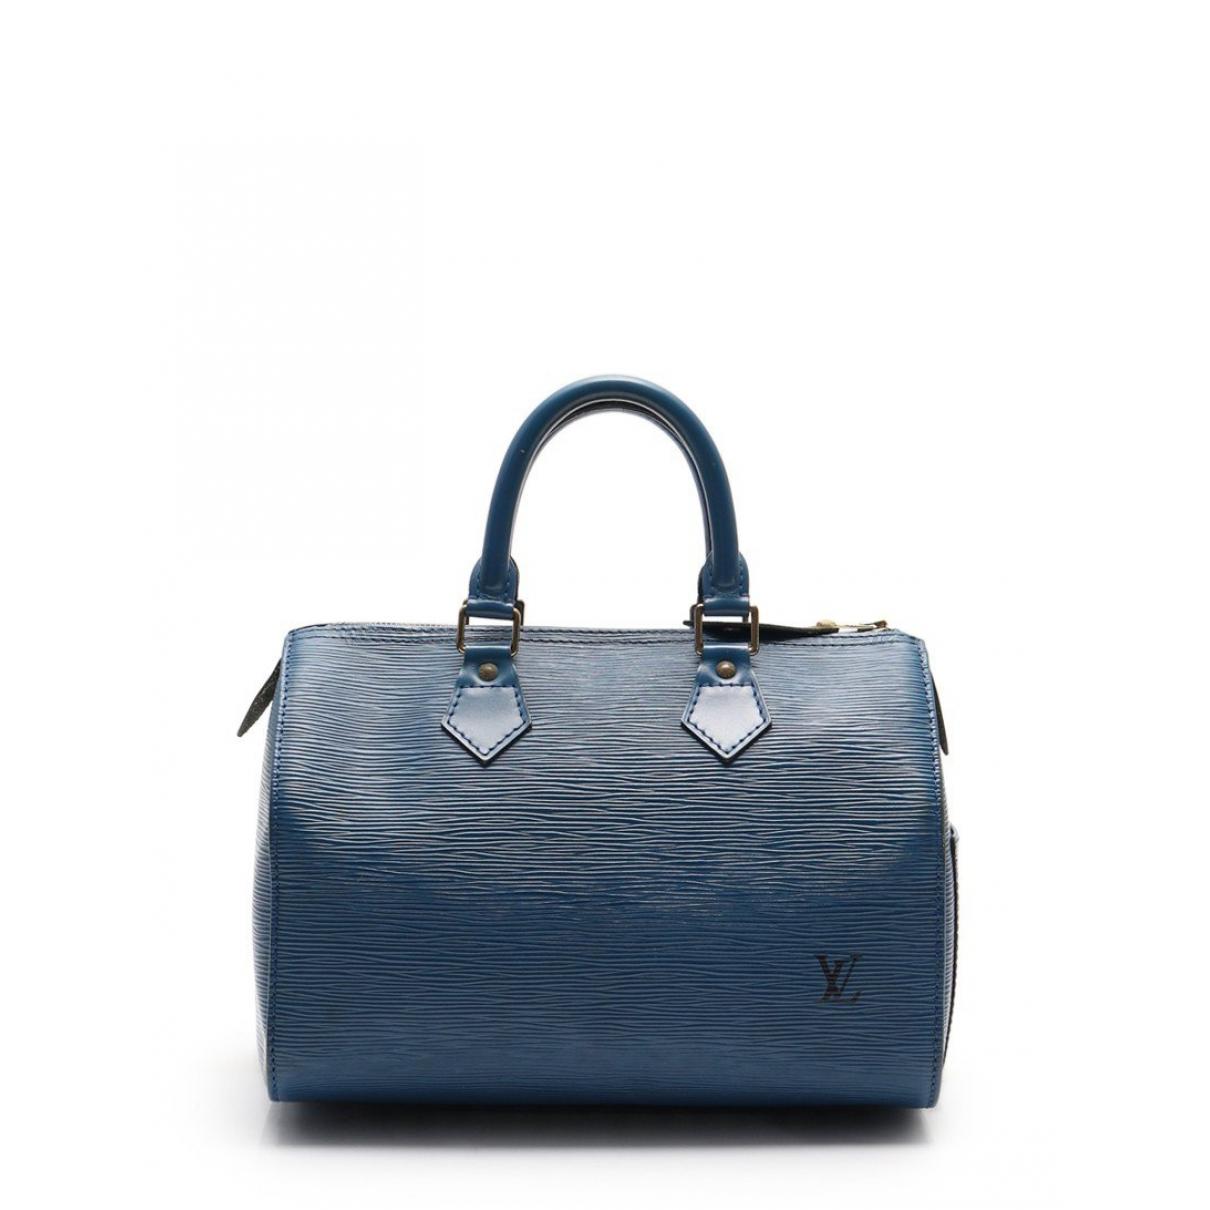 Louis Vuitton - Sac a main Speedy pour femme en cuir - bleu